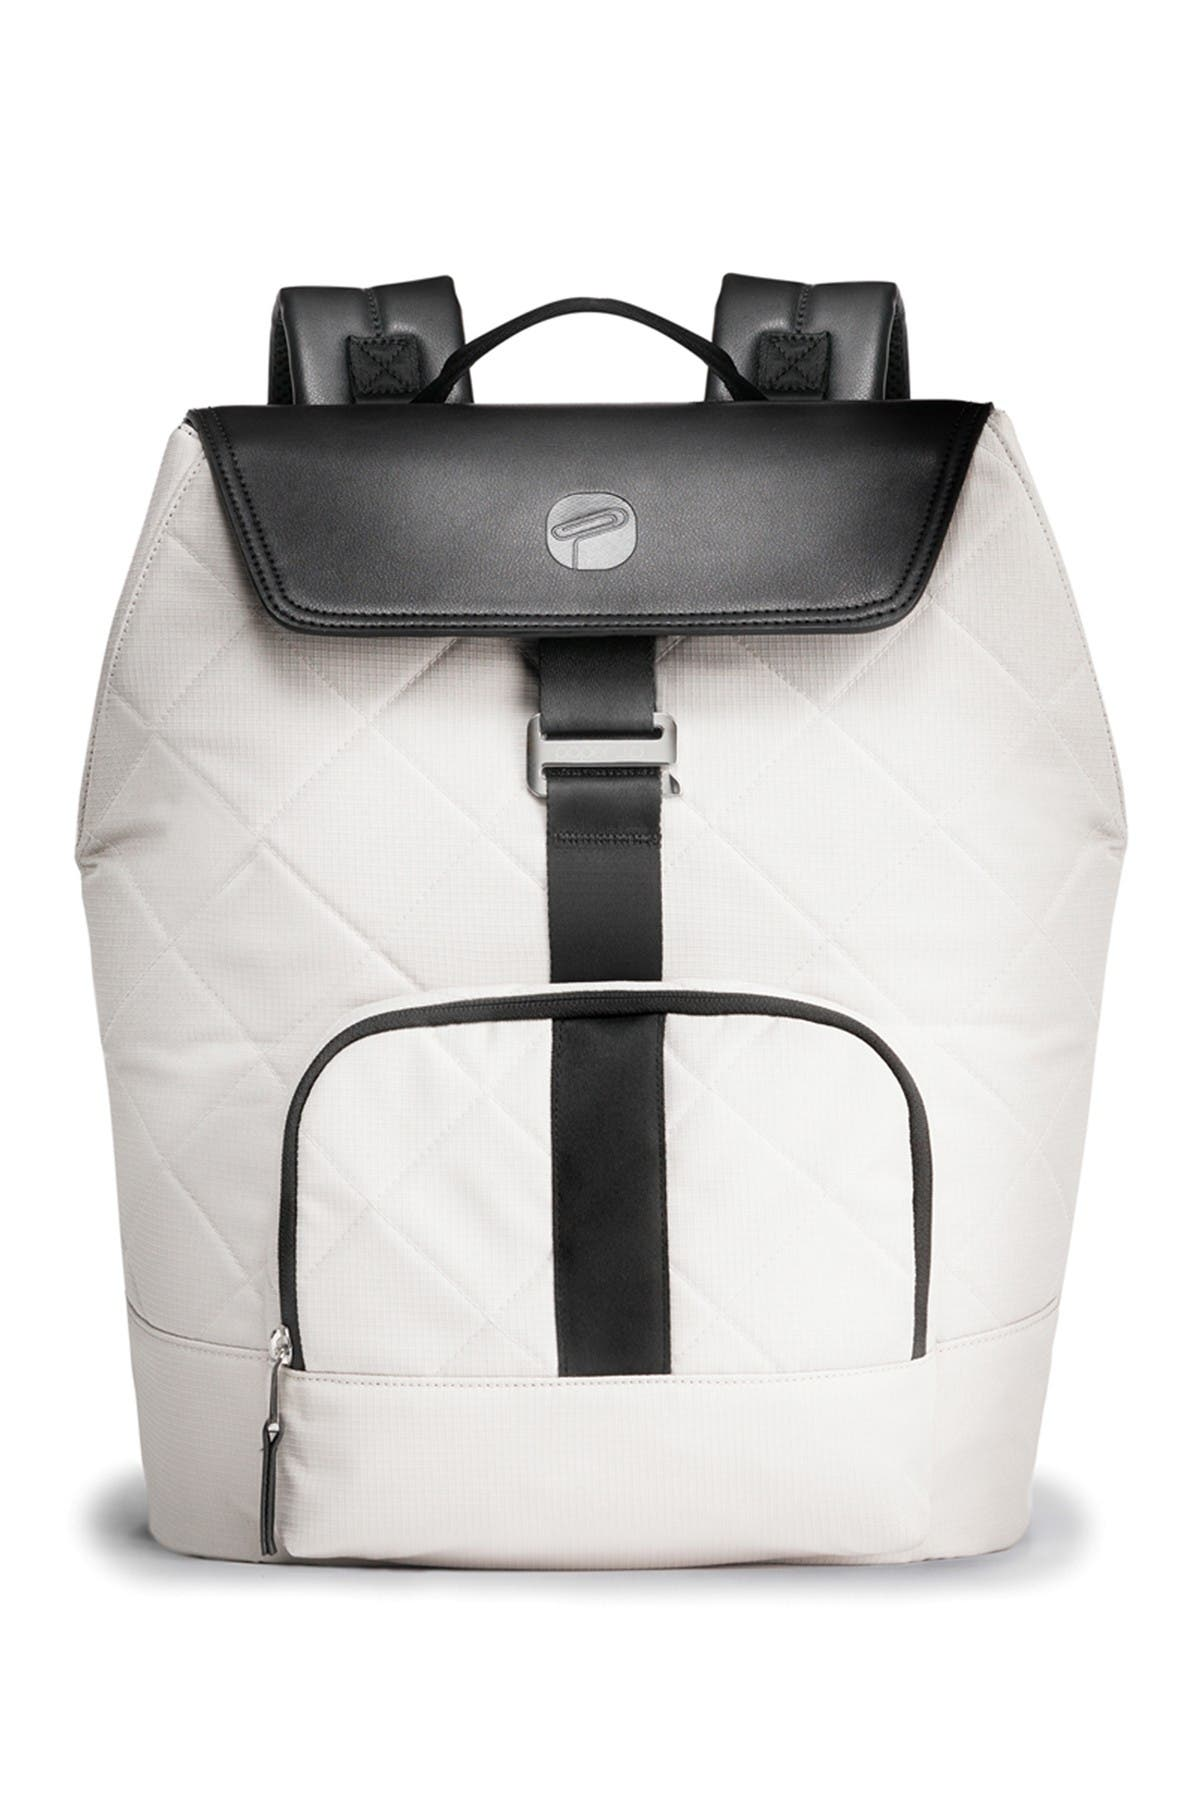 Image of PAPERCLIP Jojo Recycled Plastic Diaper Bag Backpack